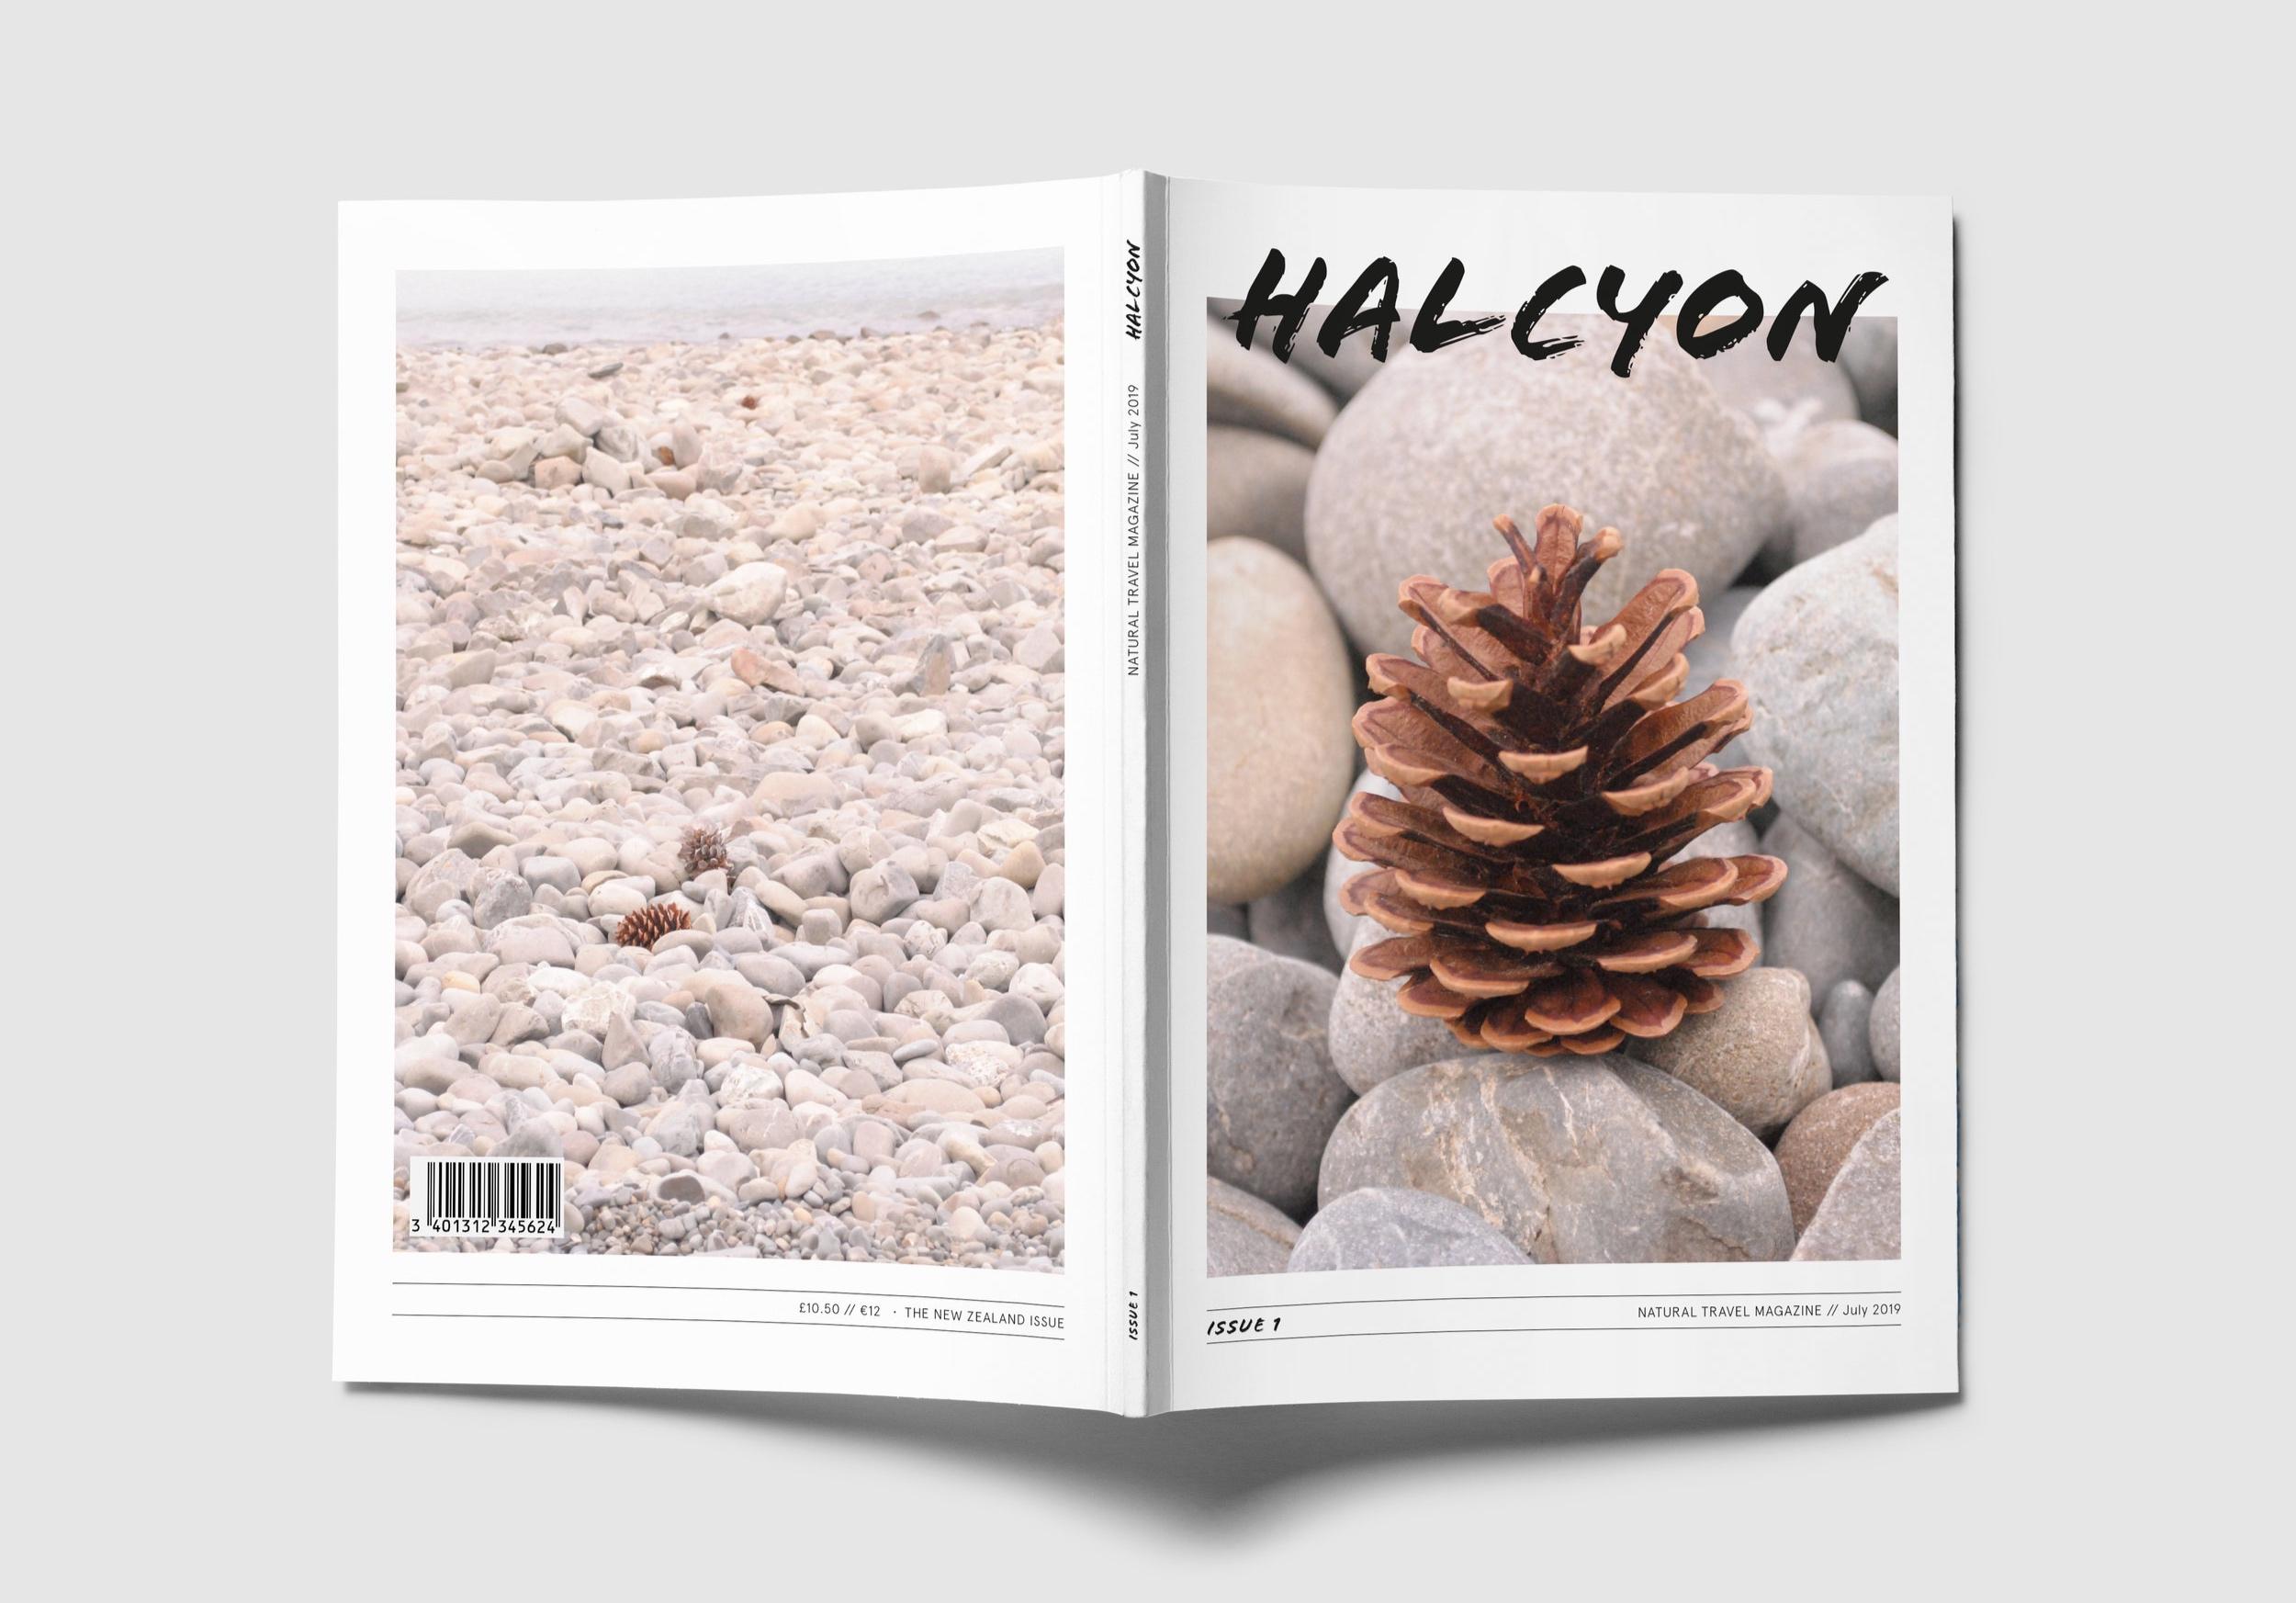 Halcyon_Magazine+MockUp_Front%26Back_Dev2.jpg